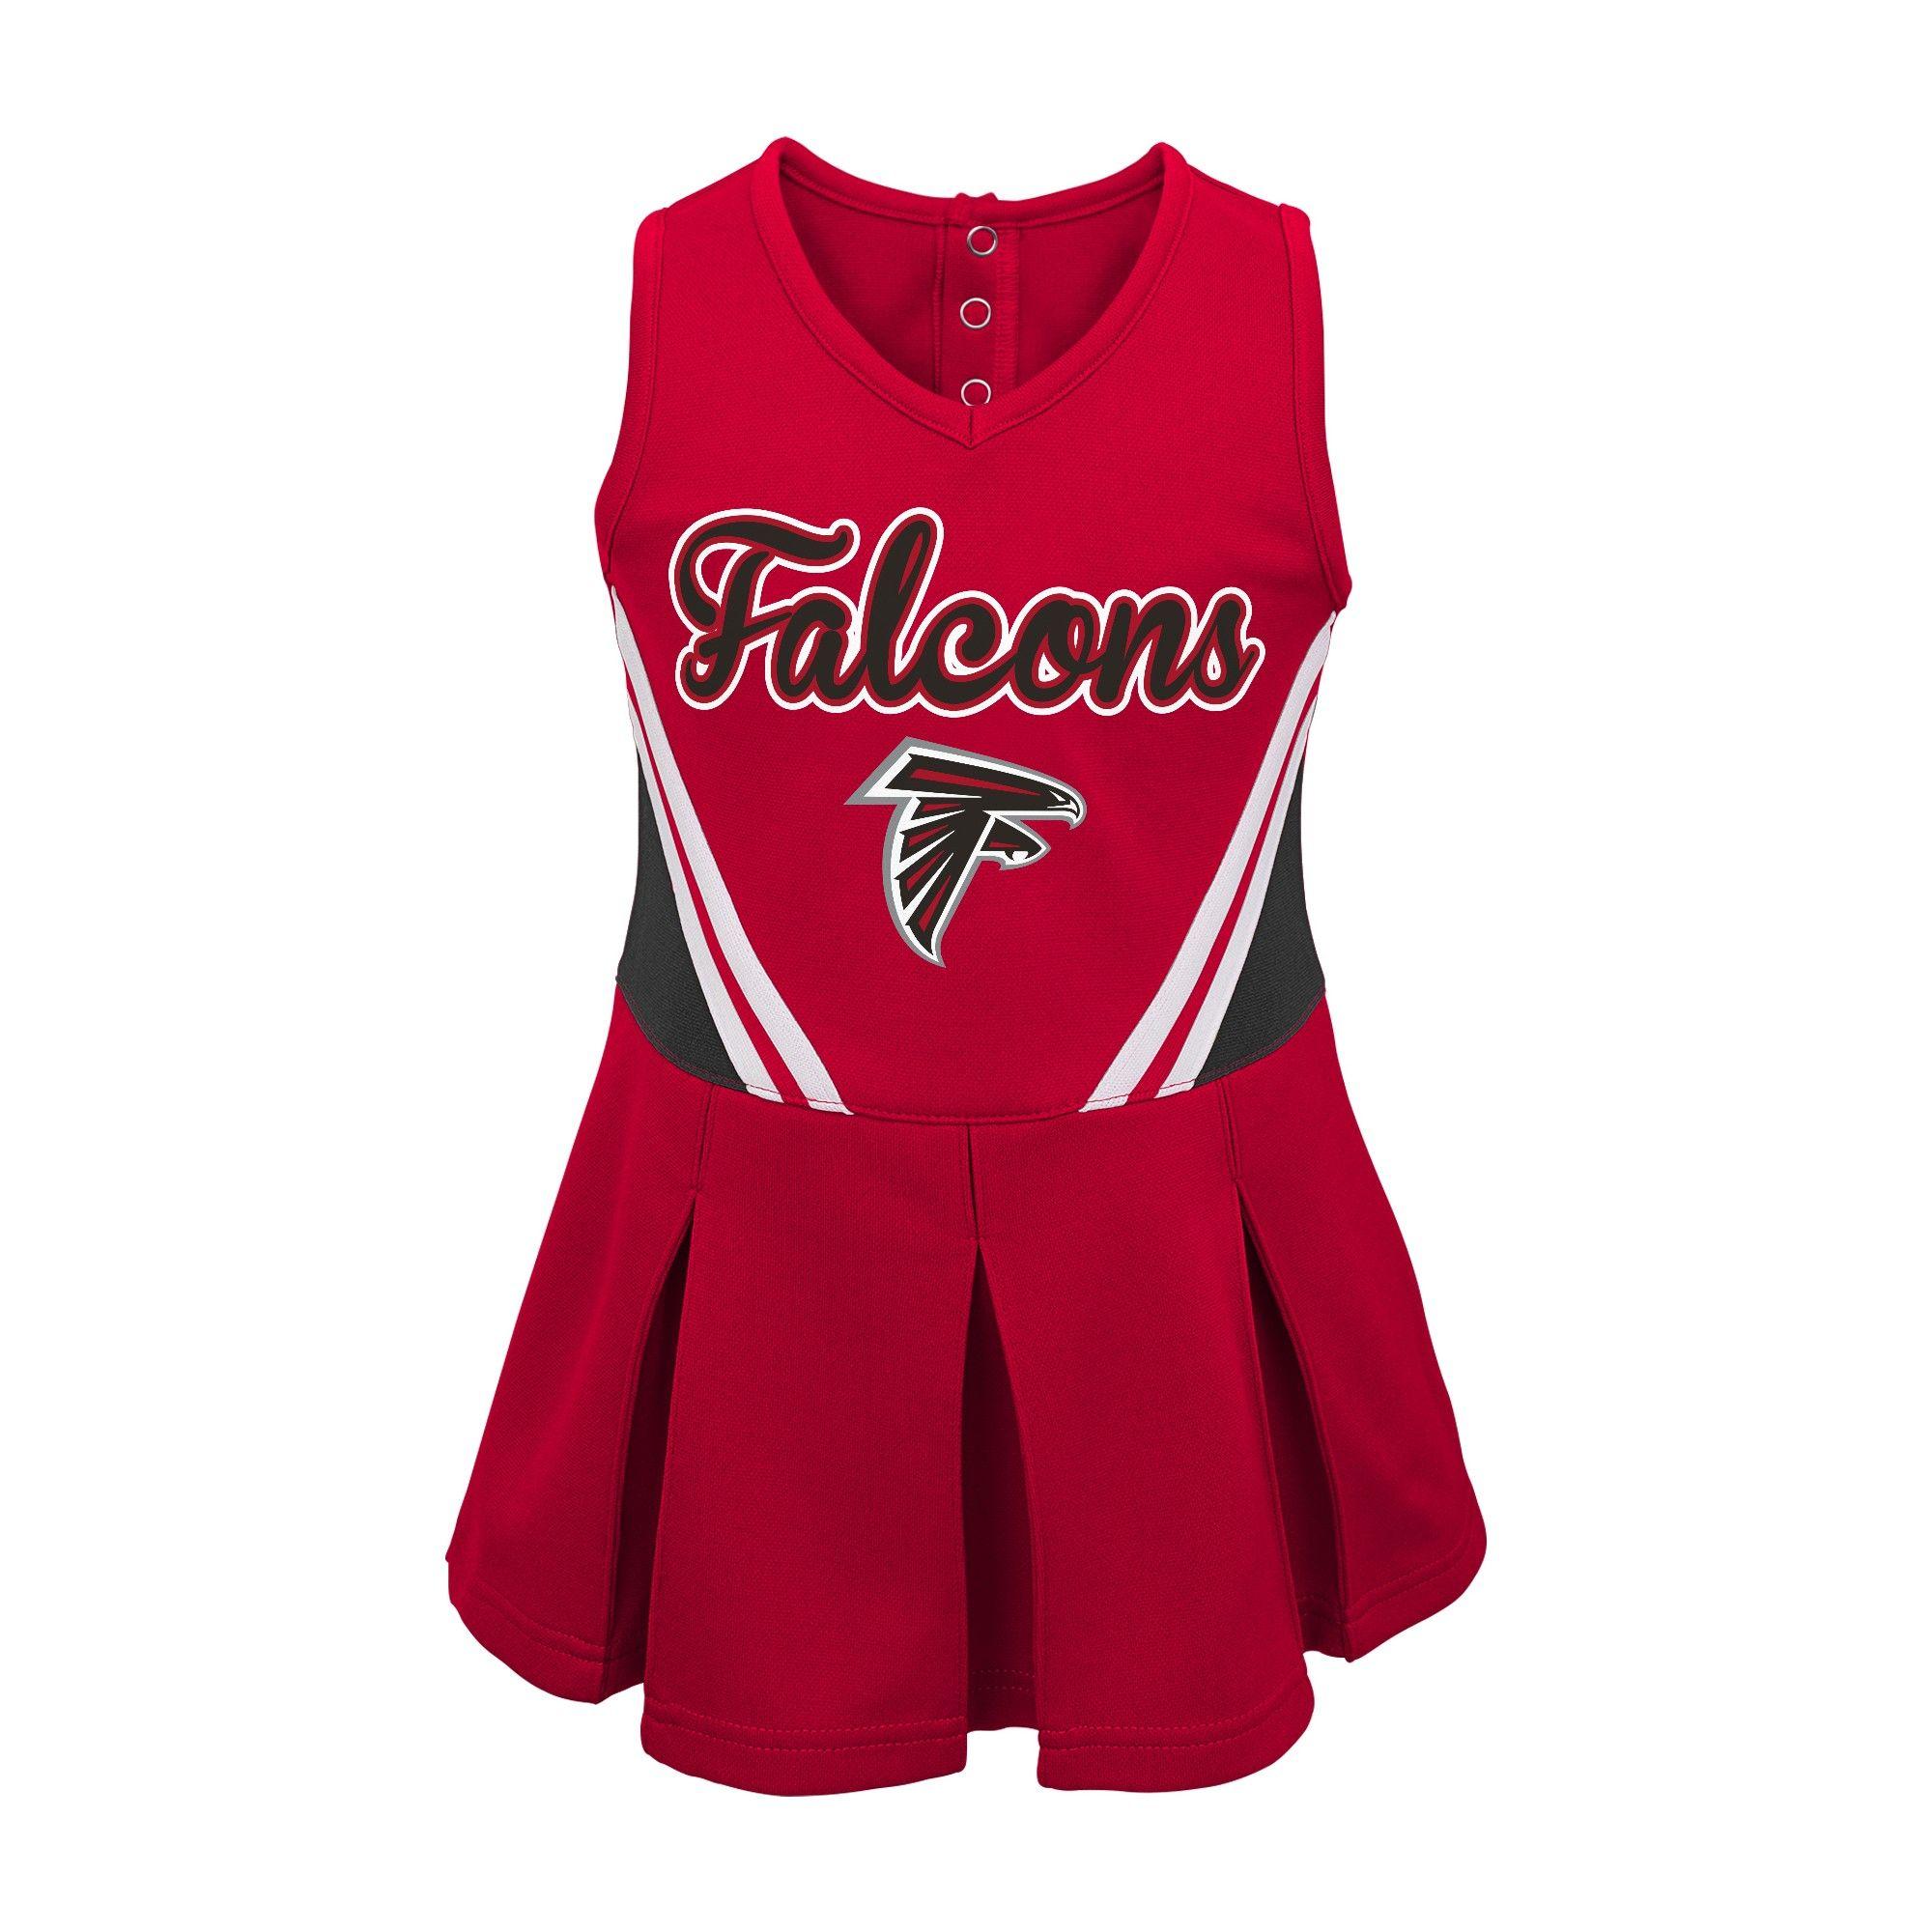 Atlanta Falcons Baby Girls Cheer Set 12 M Size 12 Months